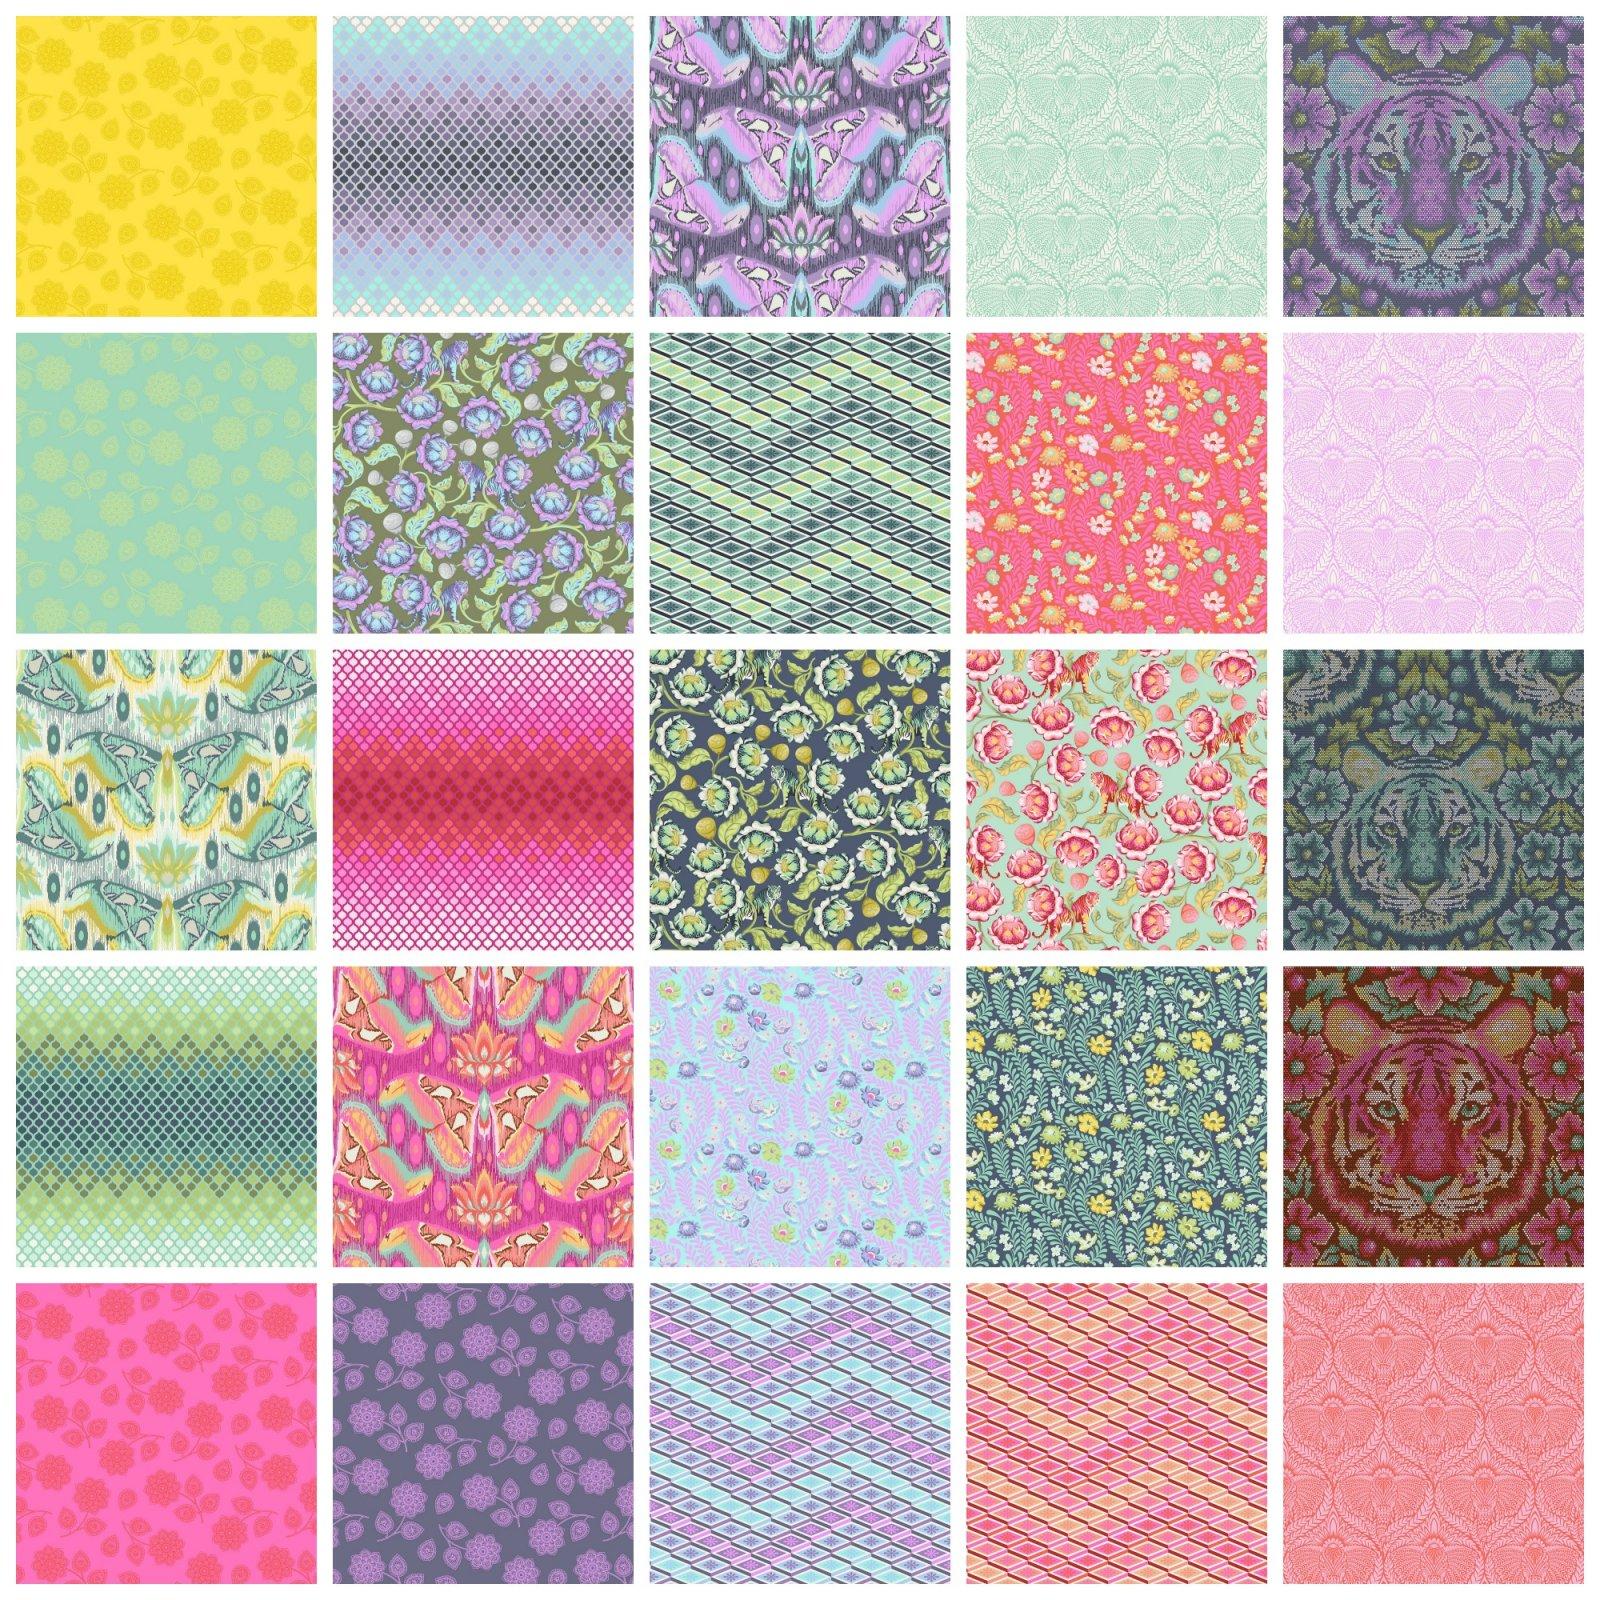 Tula Pink - Eden - 1/2 Yd Bundle - 25